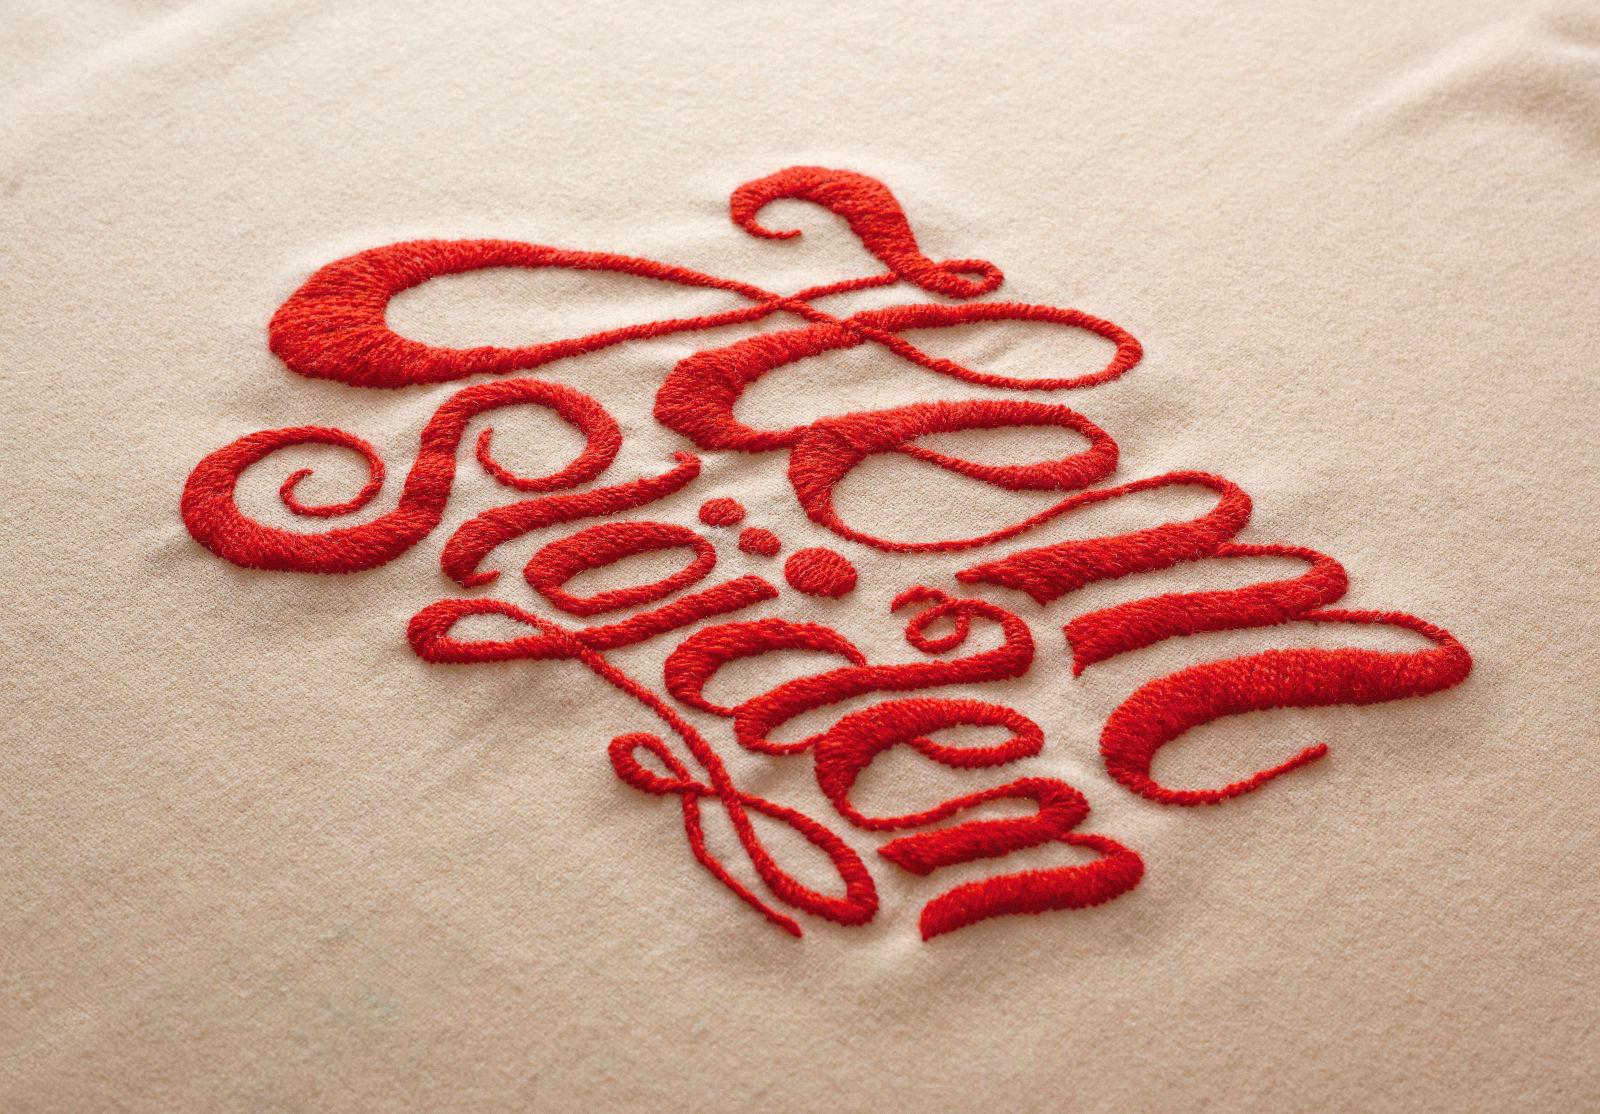 Liljevalchs: Hemslöjden — Exhibition identity - complete with embroided typography - for the Handicraft exhibition